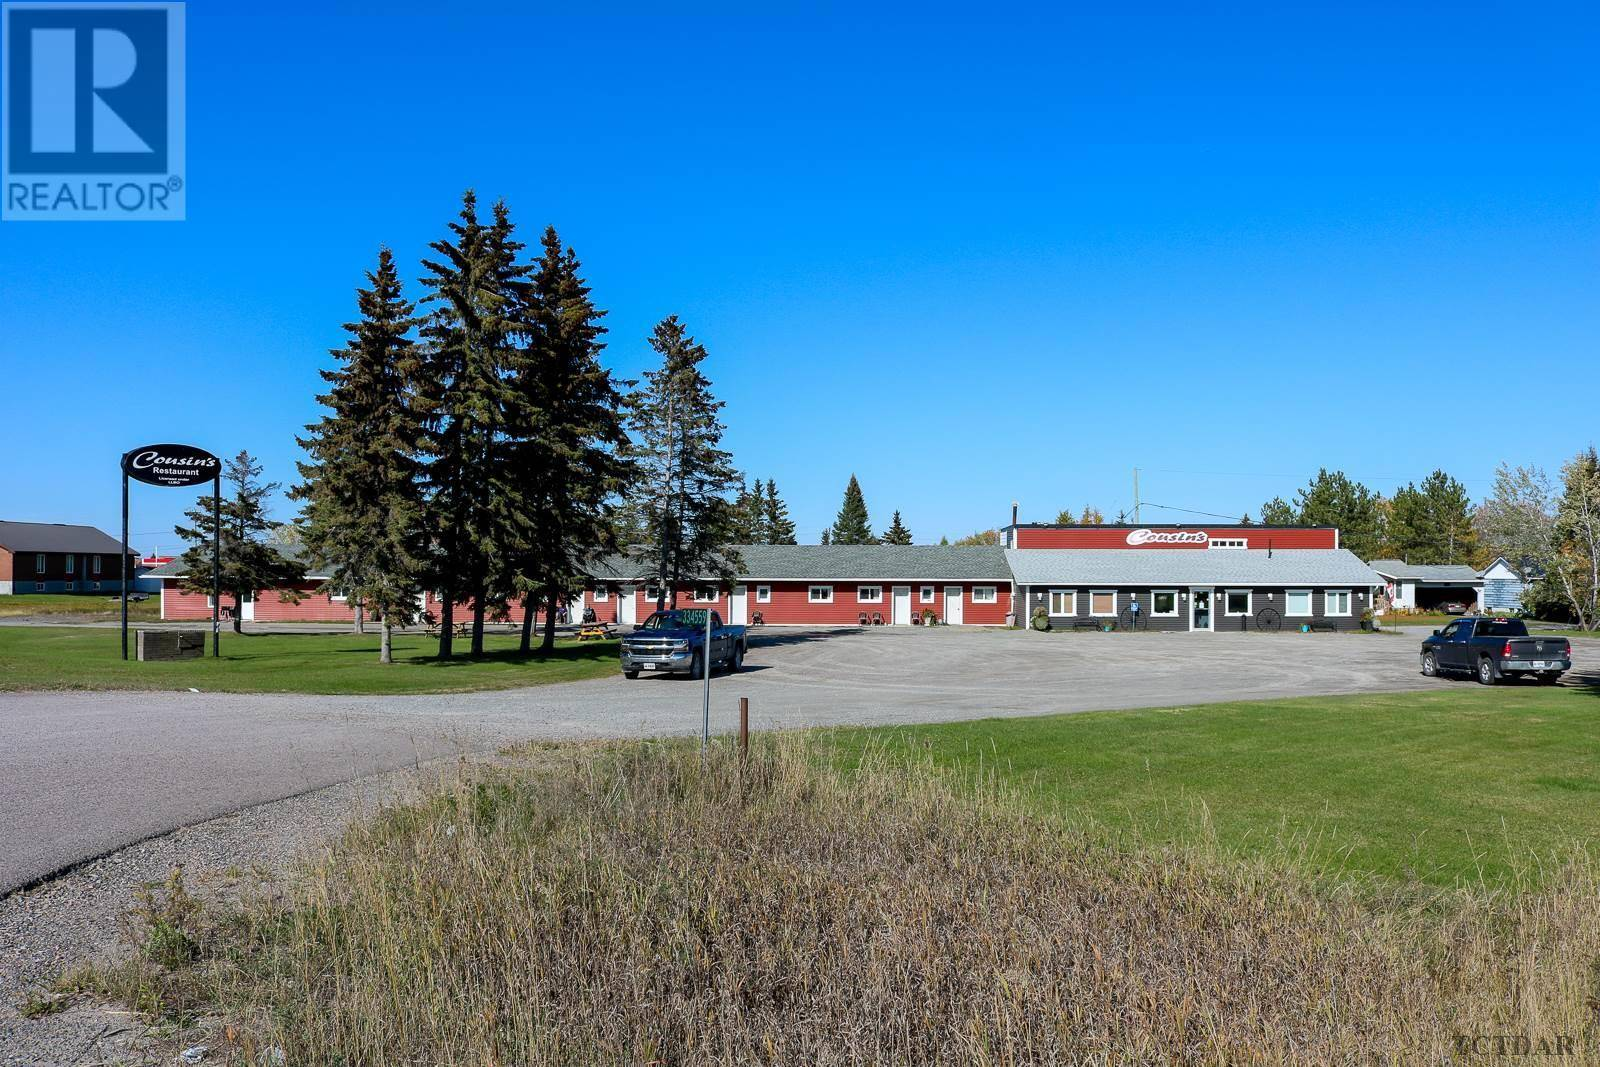 Residential property for sale at 334559 11 Hy N Englehart Ontario - MLS: TM192402